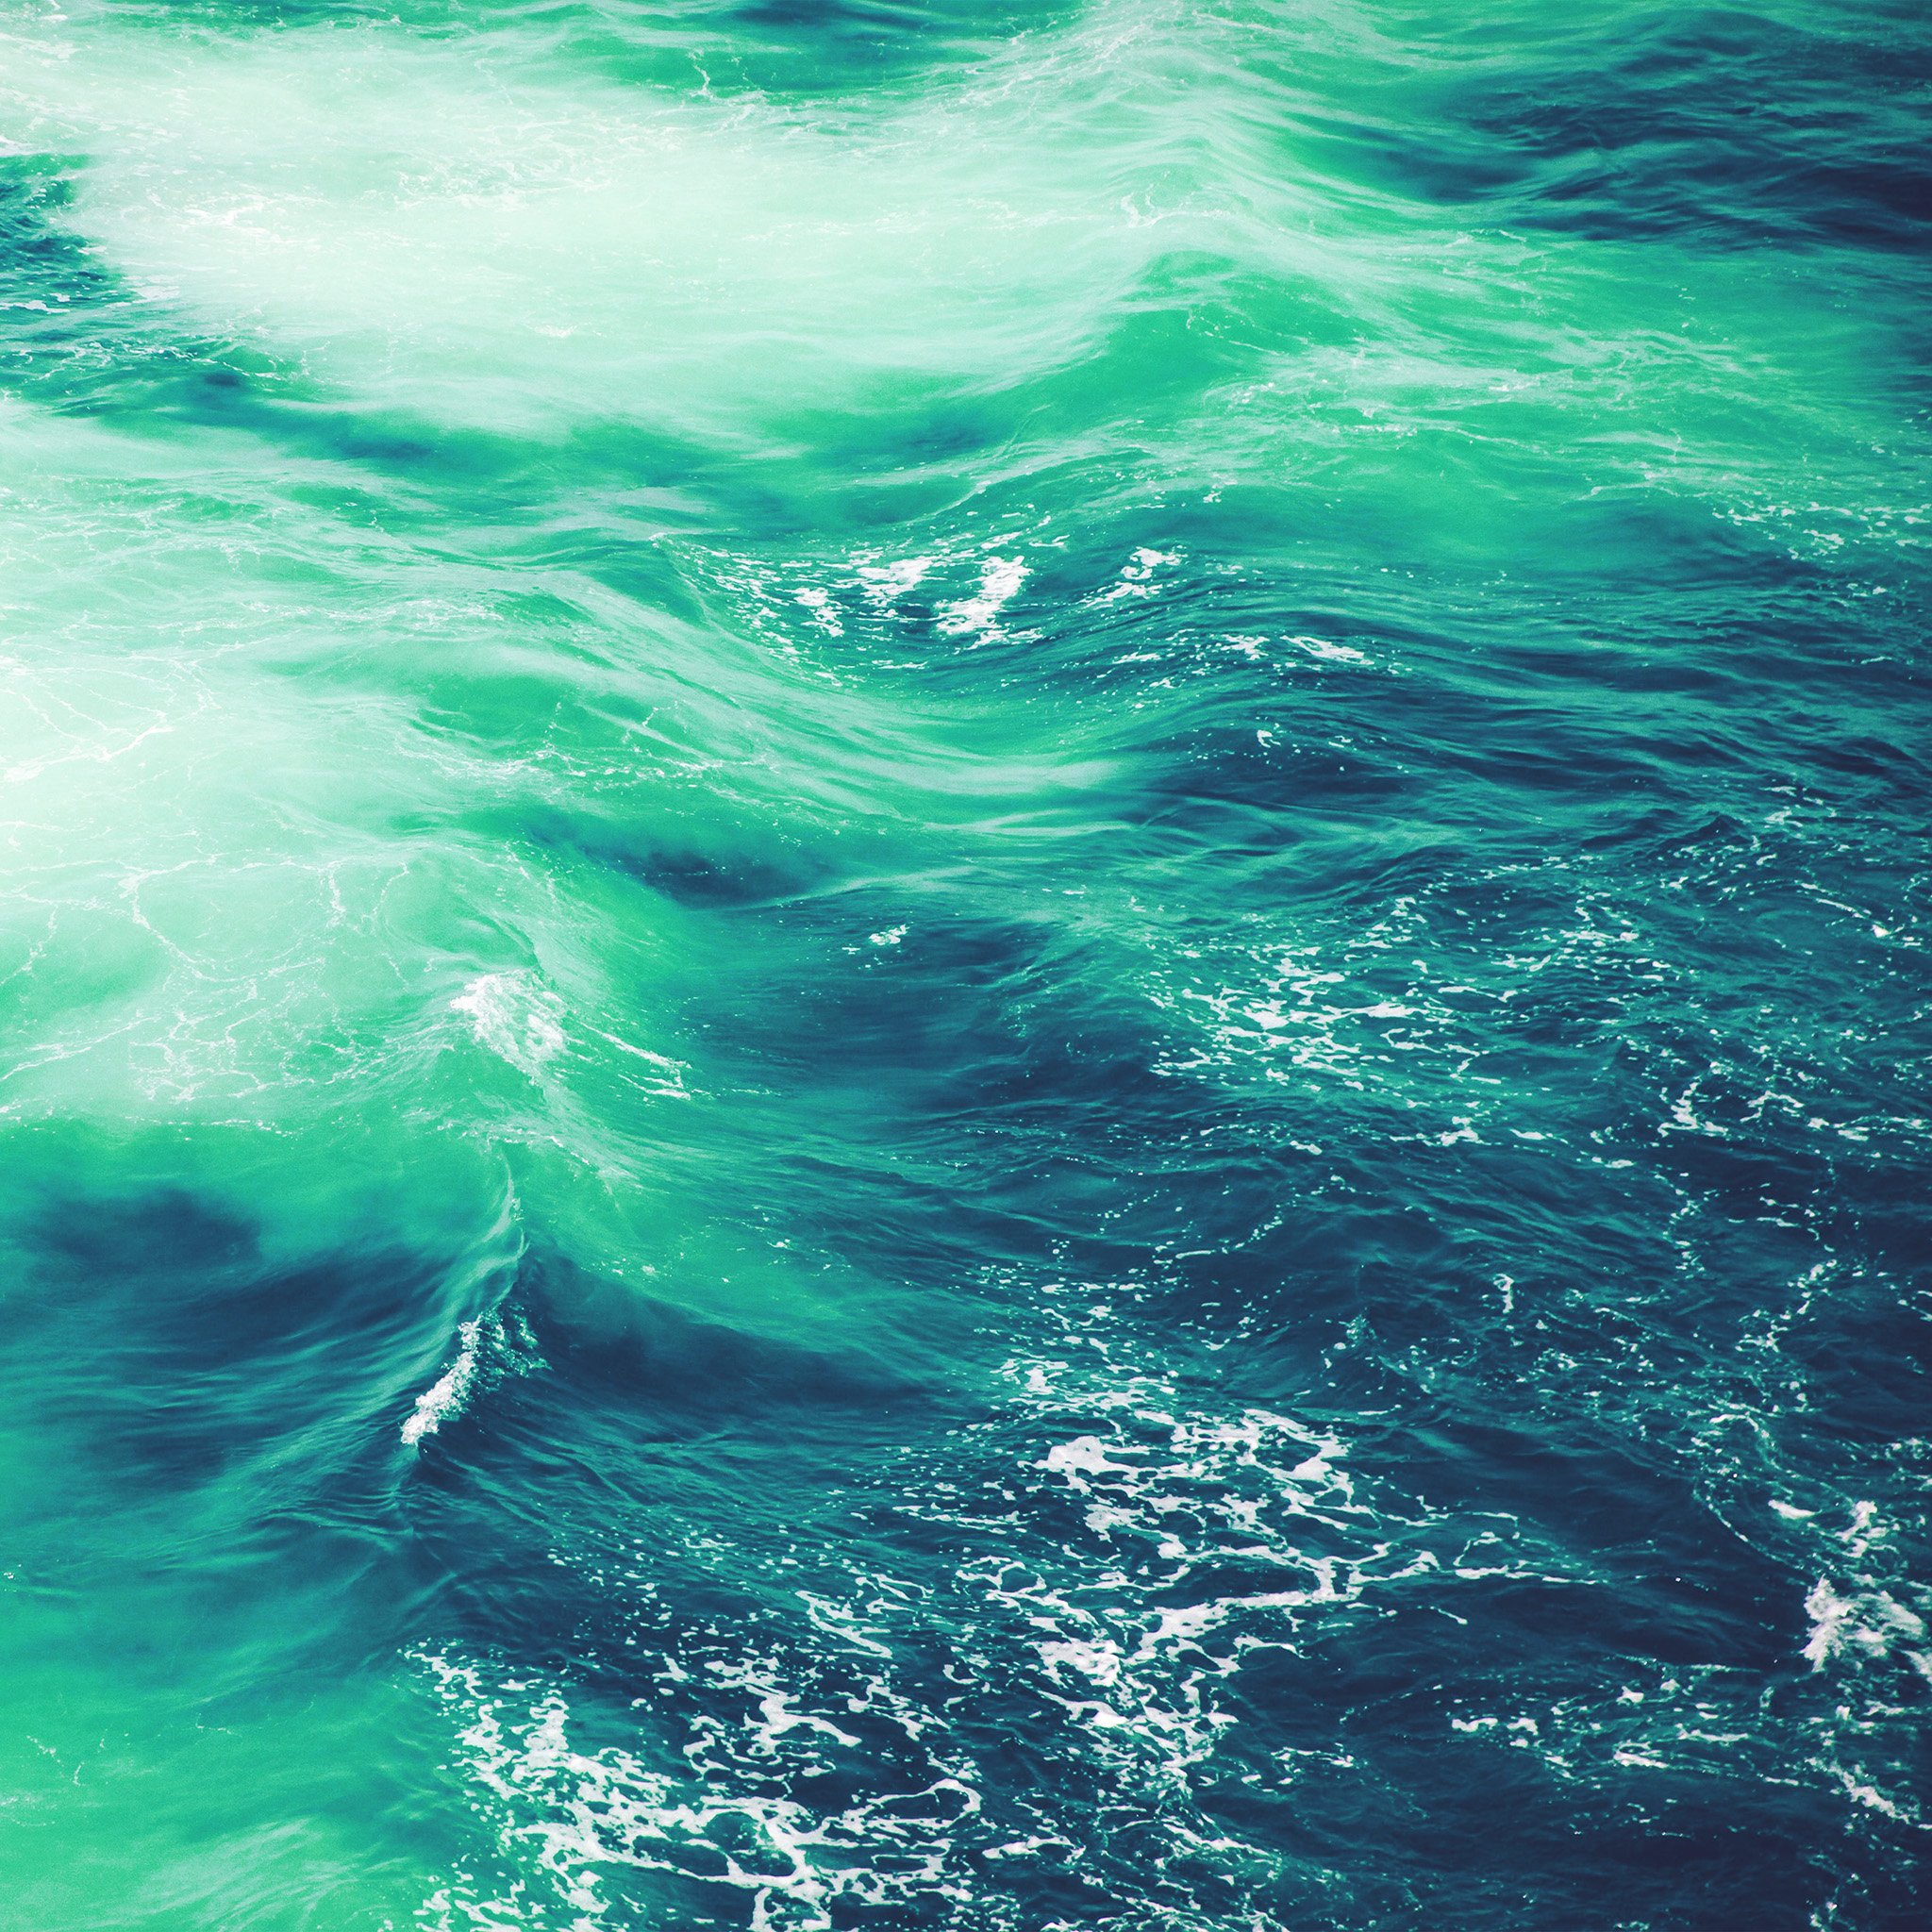 Green Desktop Wallpaper: Vq24-wave-nature-water-blue-green-sea-ocean-pattern-wallpaper